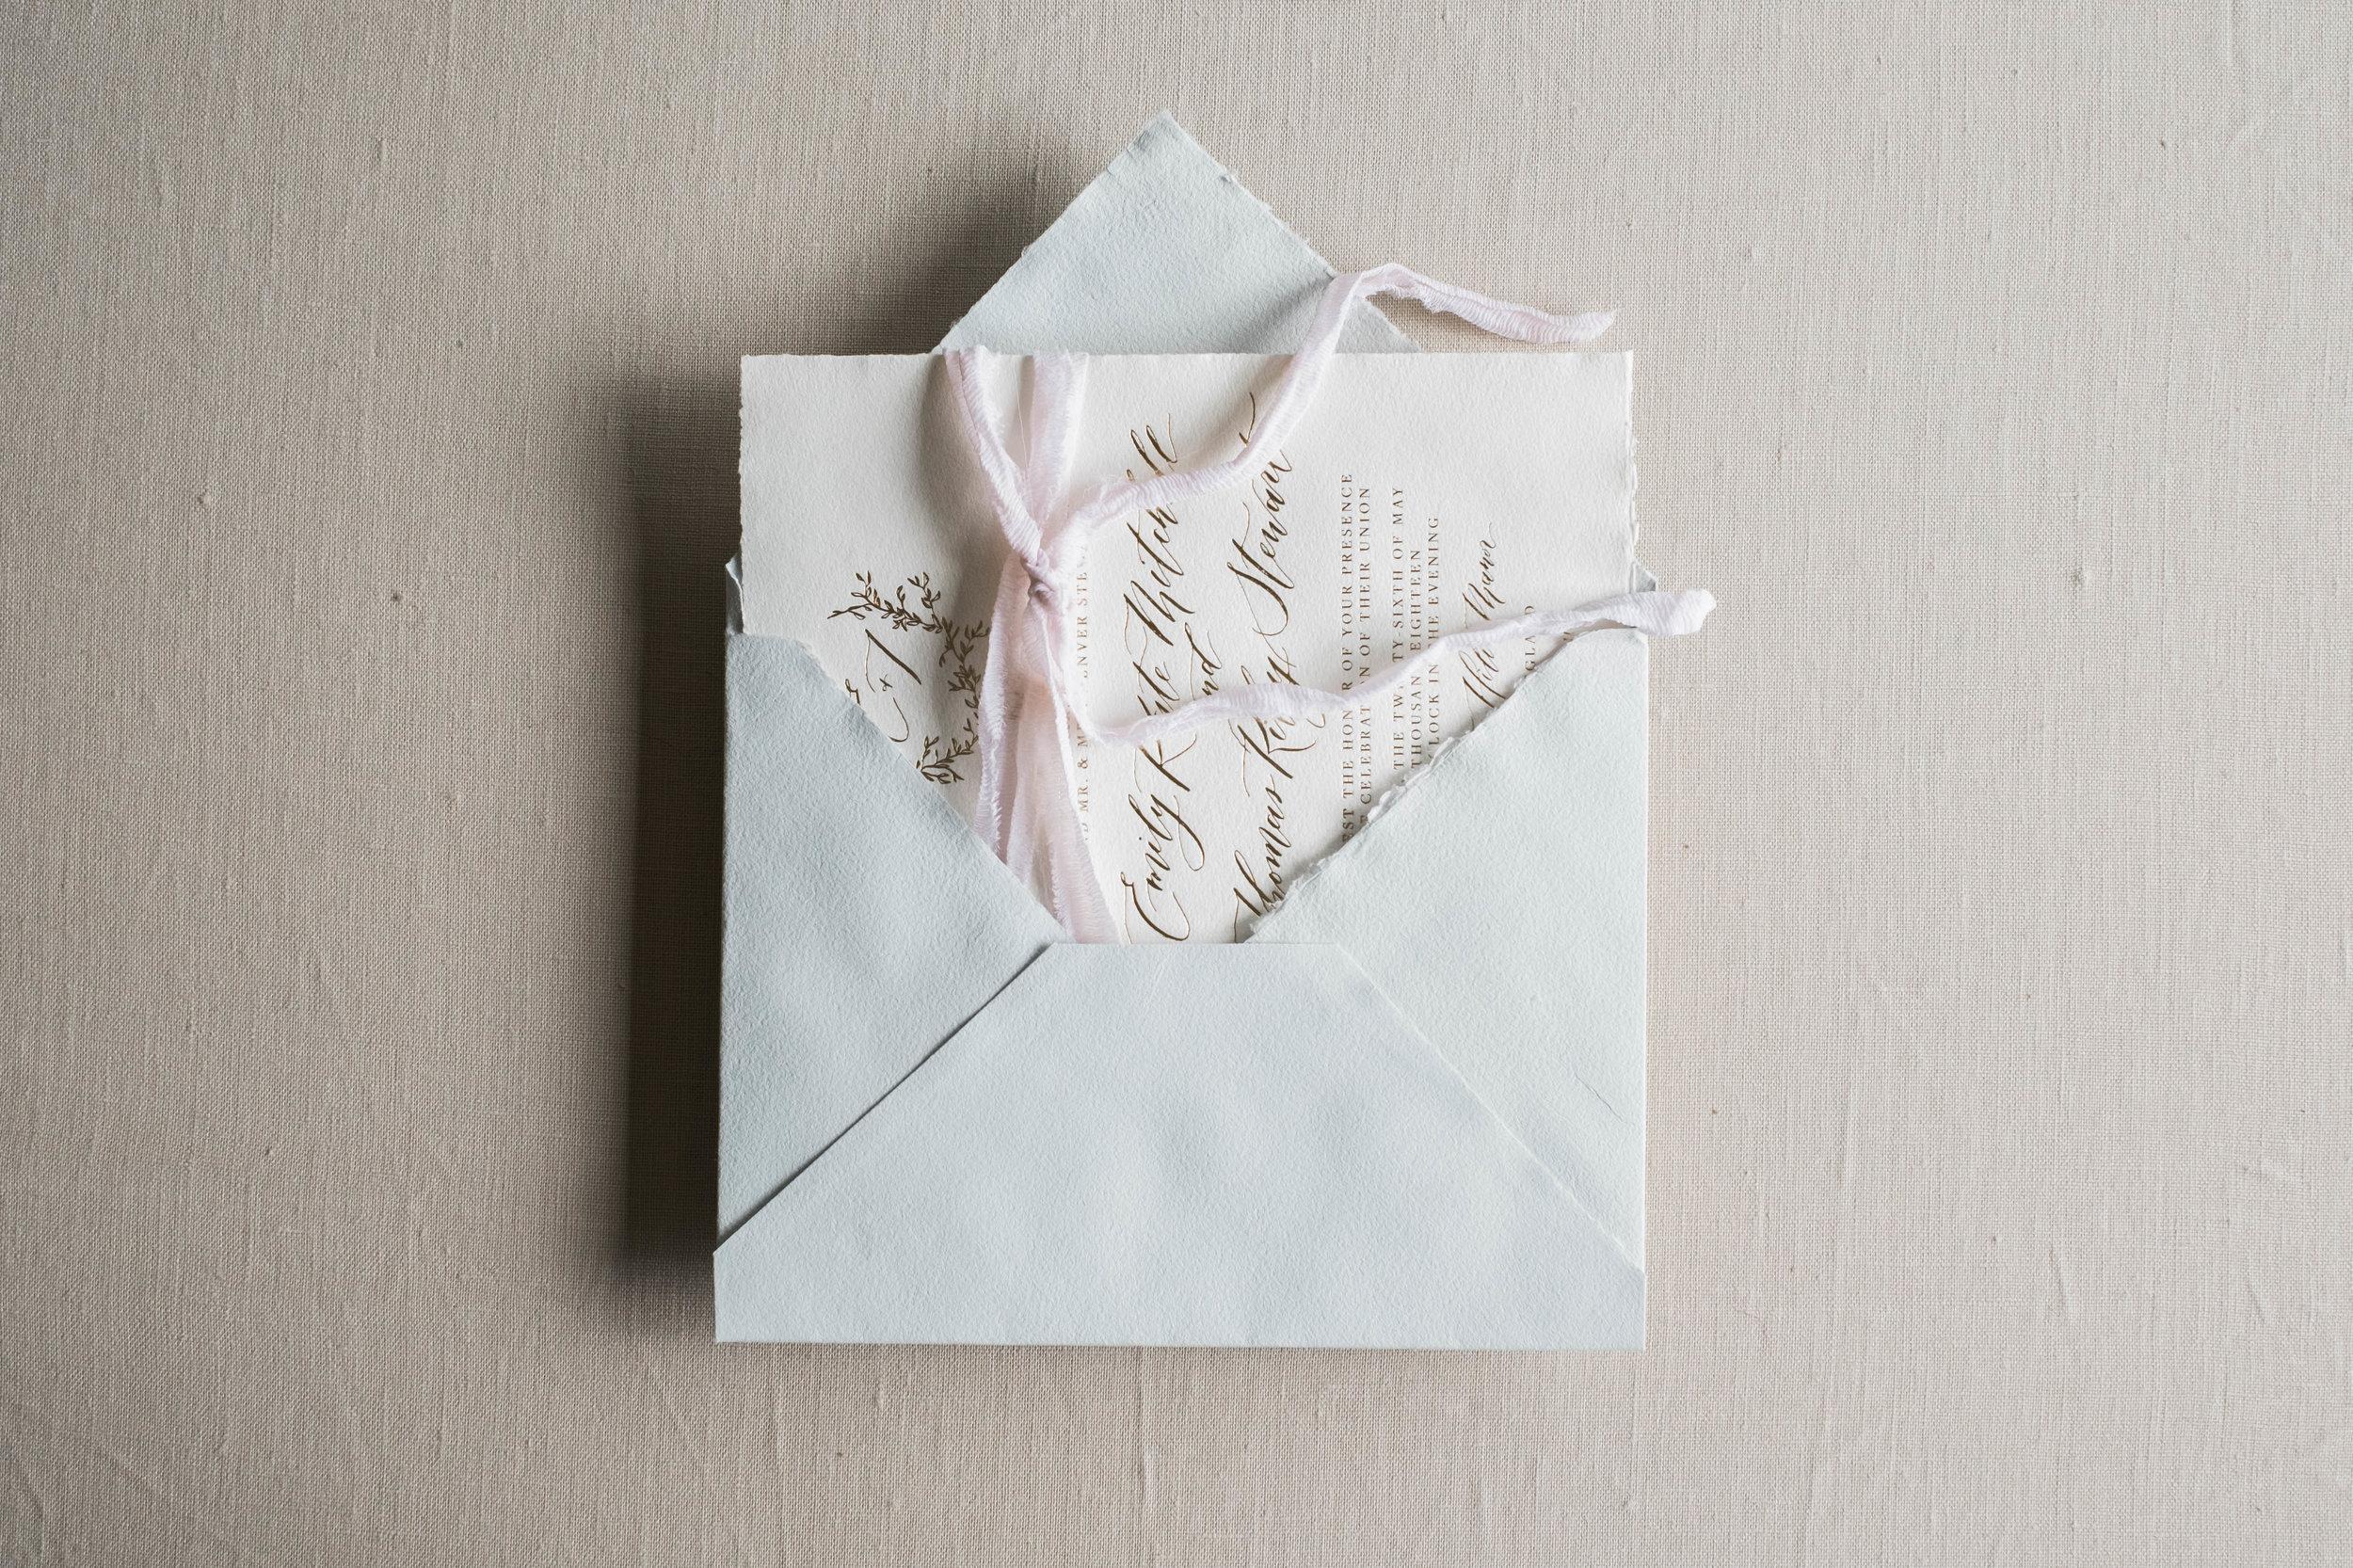 Main invitation in handmade paper